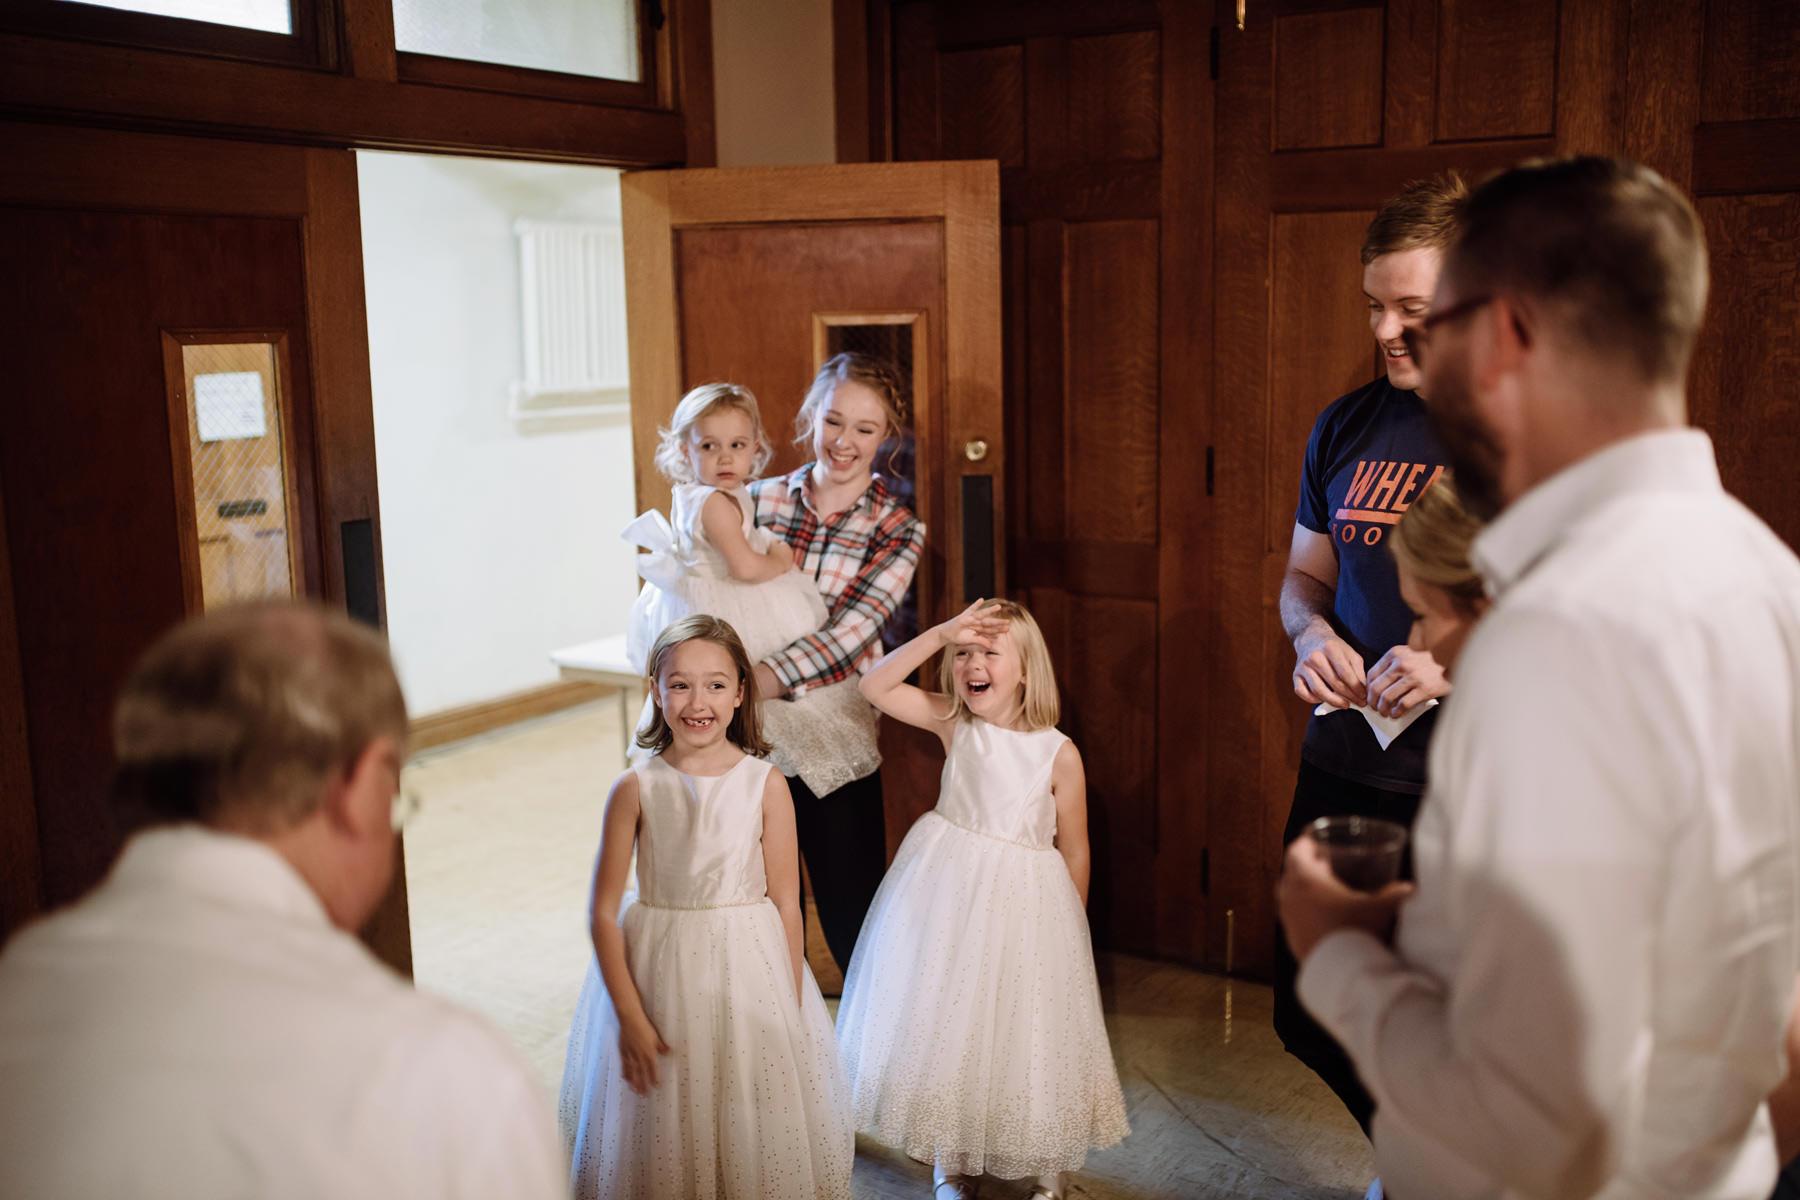 Memorial Presbyterian Wedding in St. Louis Missouri_Kindling Wedding Photography029.JPG